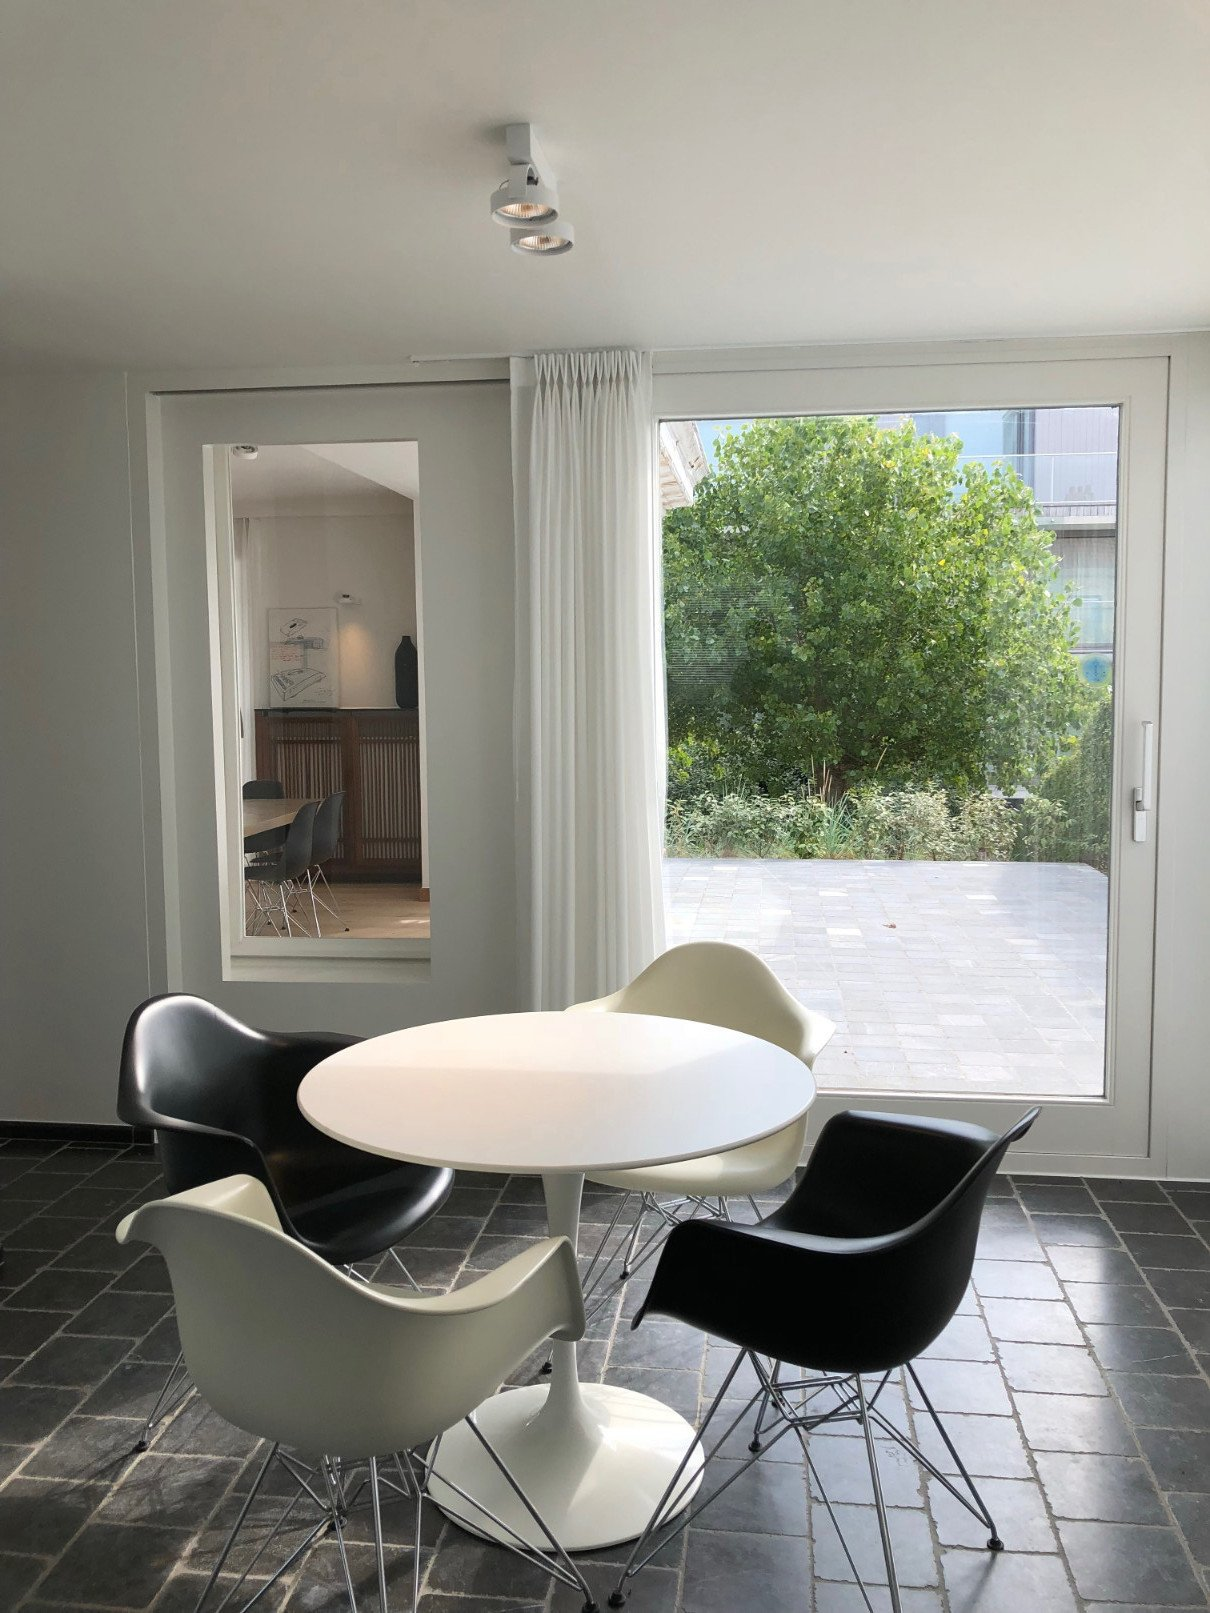 Rietveldprojects-Villa Were Di - Te Koop : Te Huur (per week)34